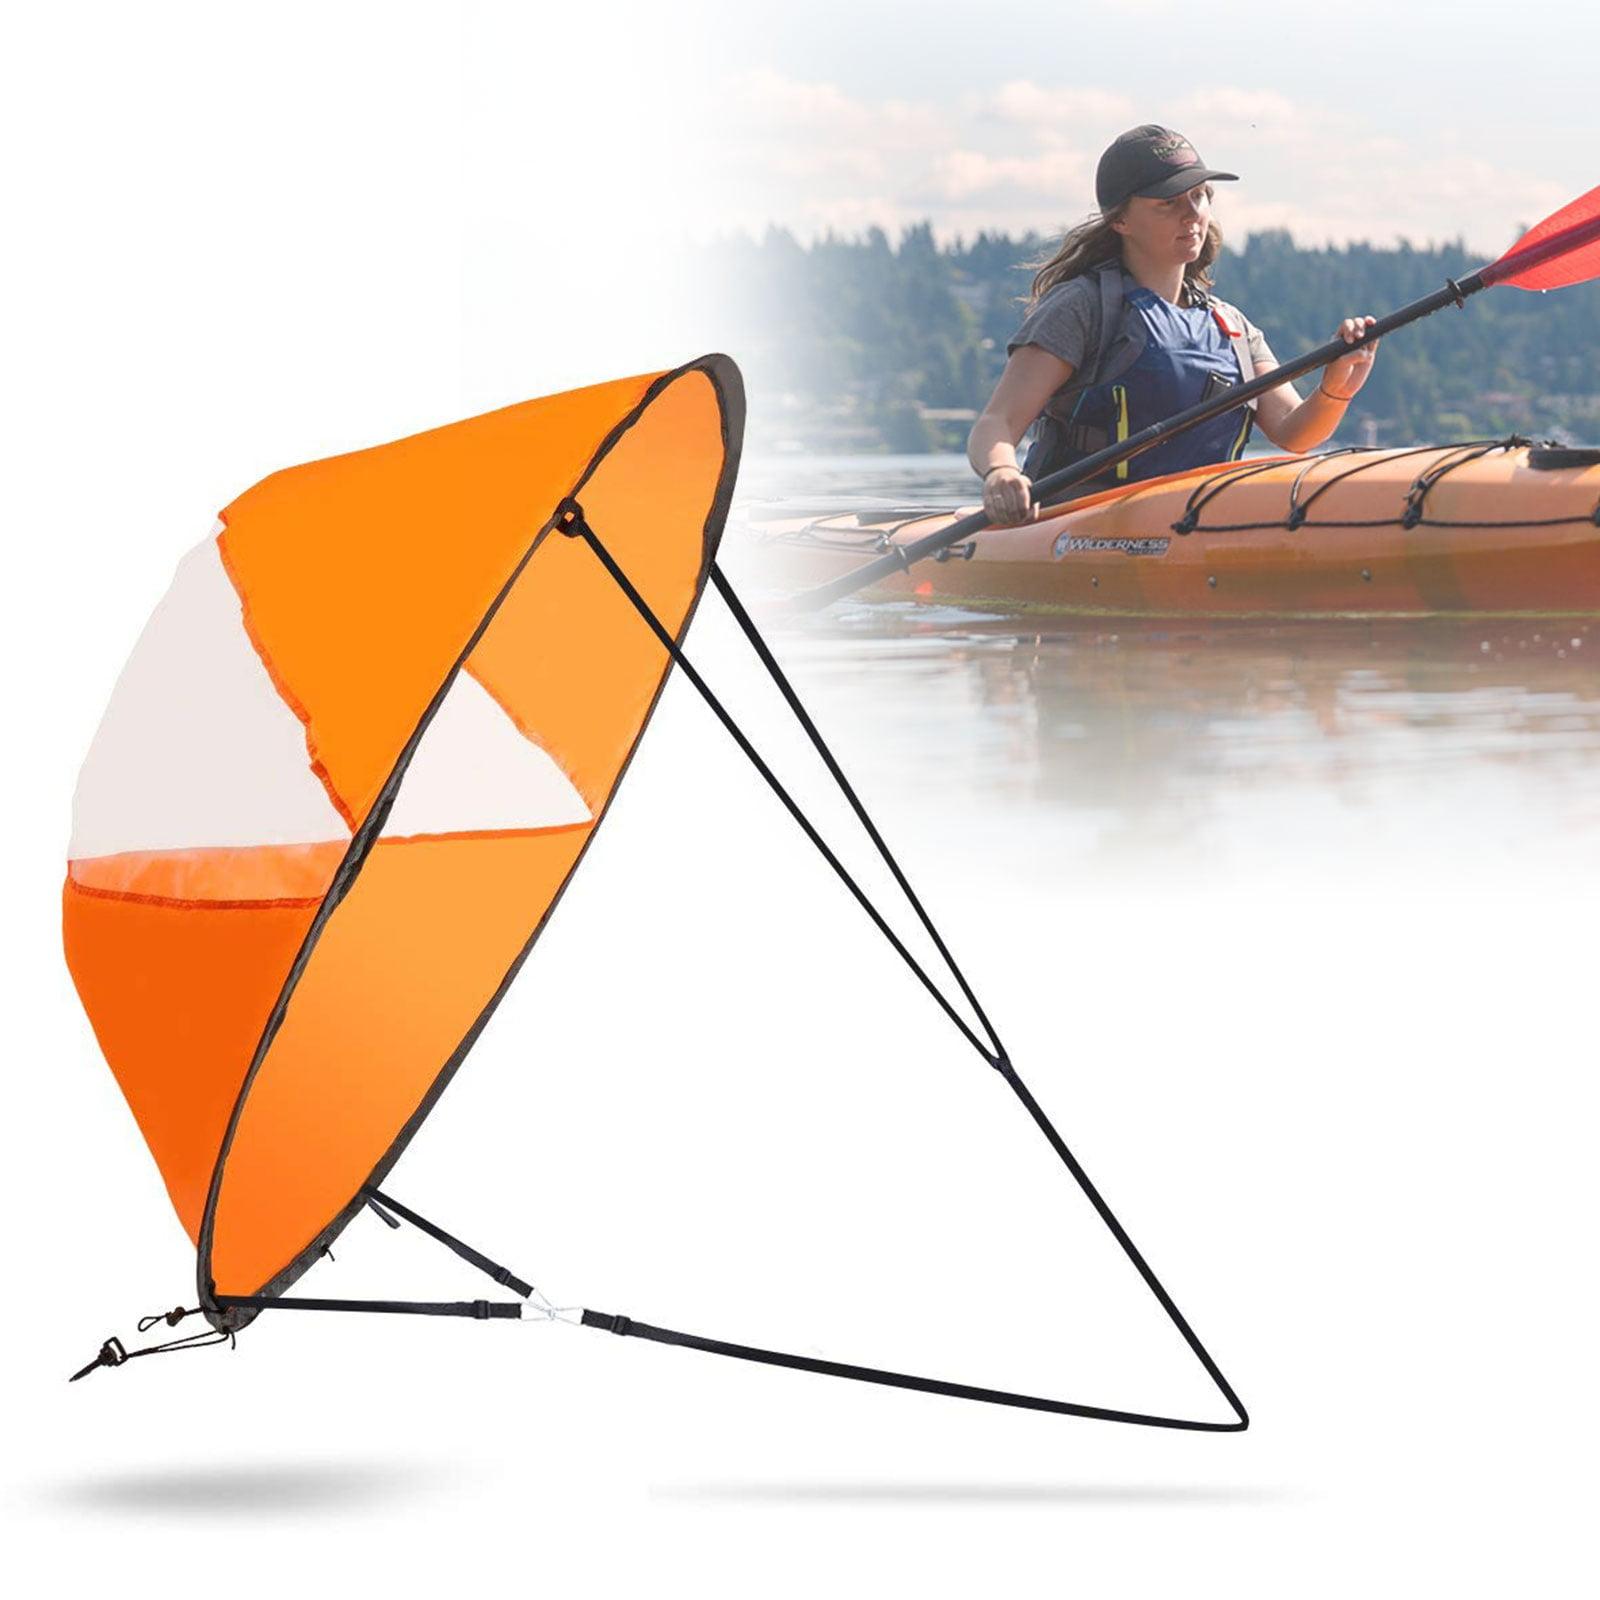 "EEEKit 42"" Kayak Downwind Kit  Foldable Wind Paddle Kit Sail Sup Paddle Board Instant Popup Wind Sail for Kayak Sailboat Canoe Boat"